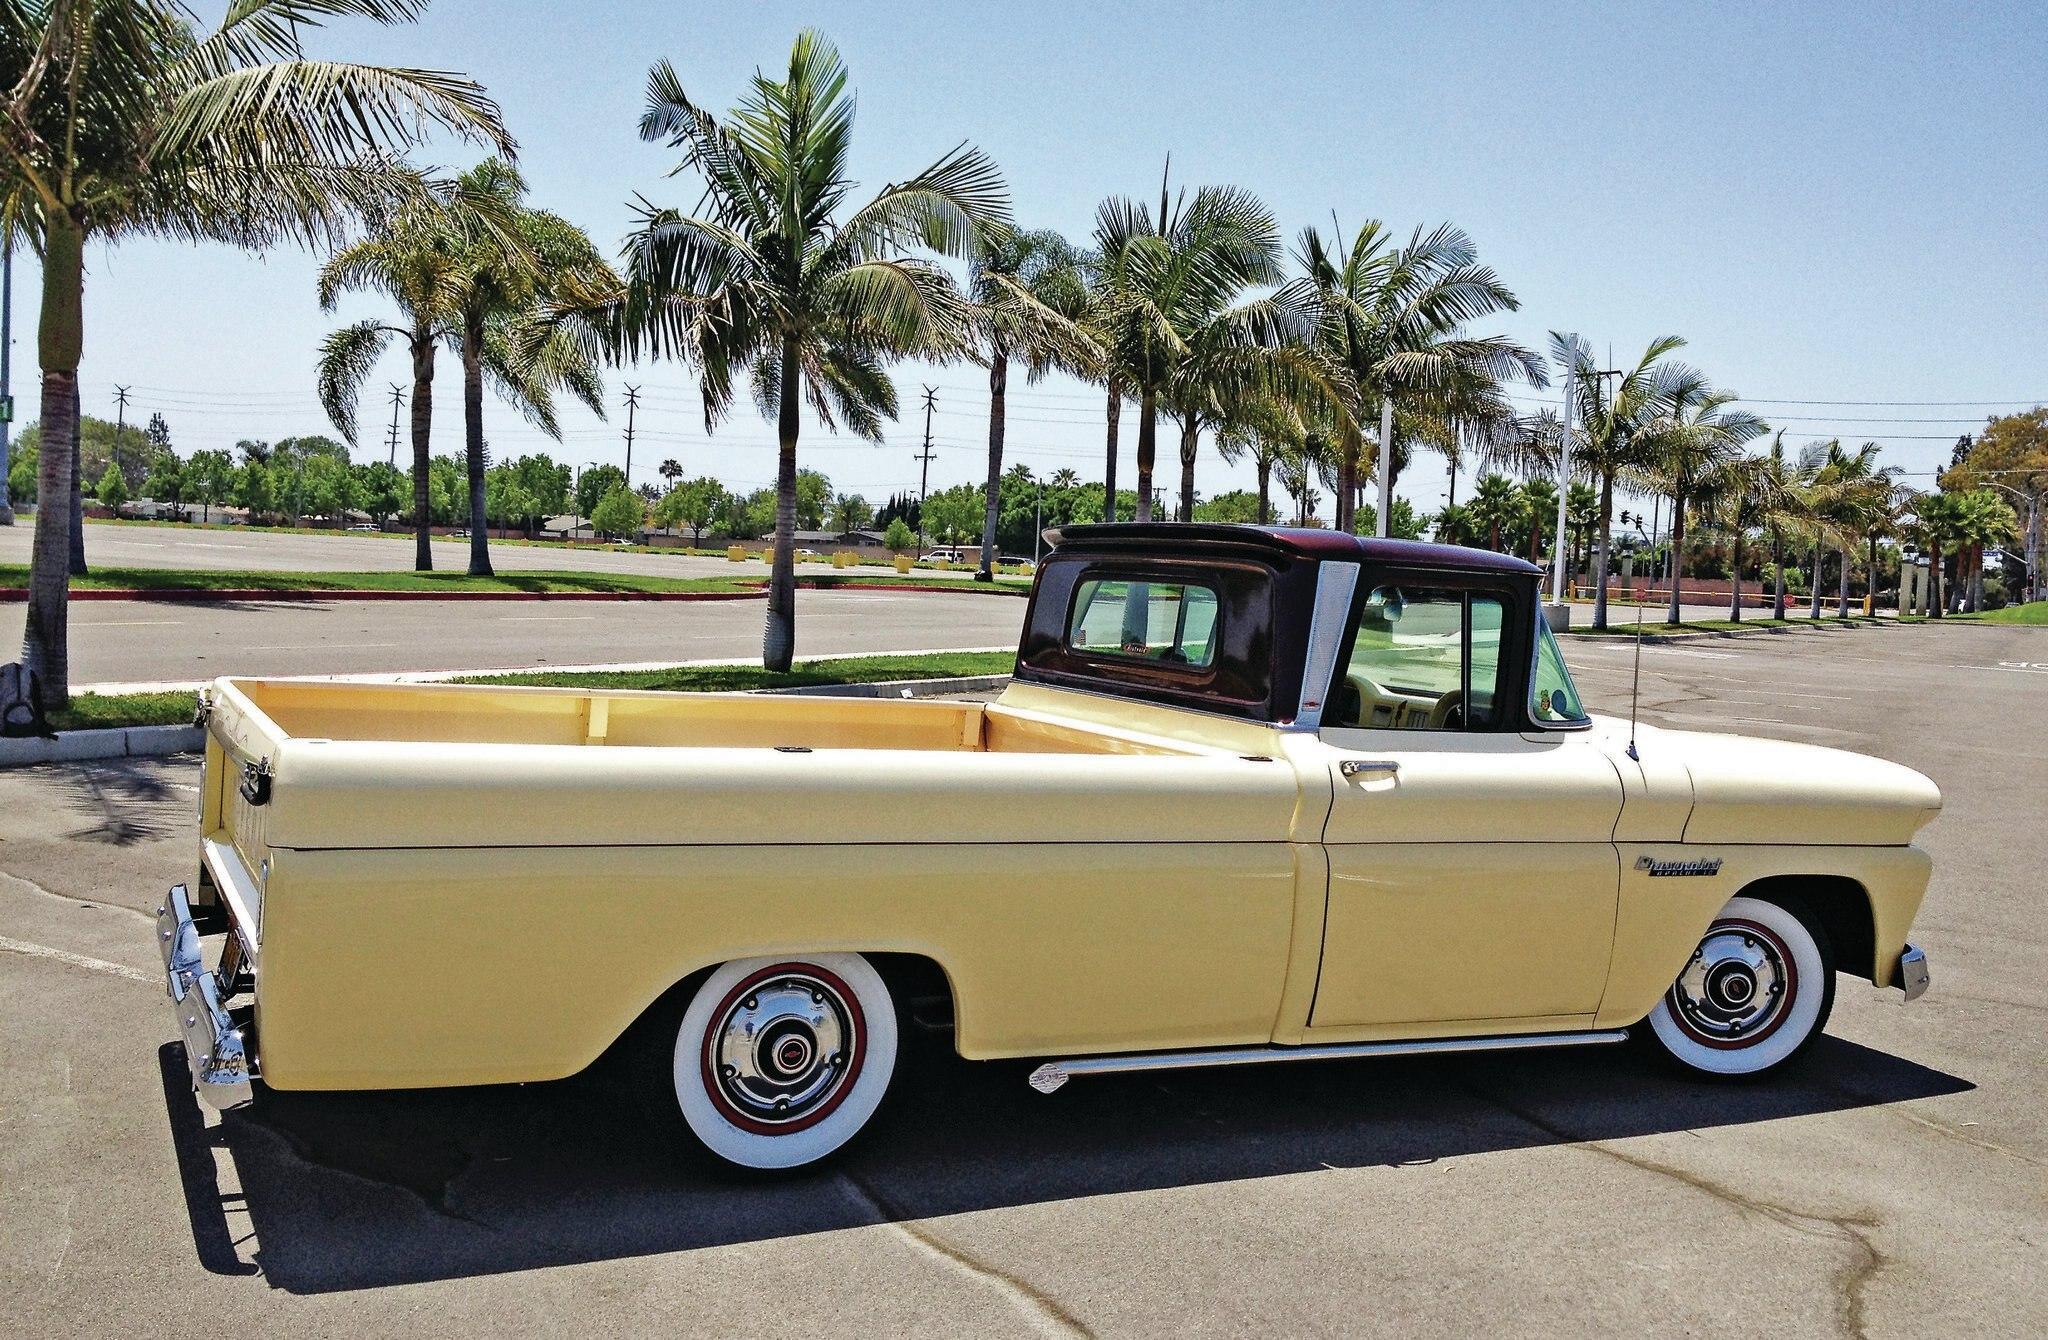 1960 Chevrolet Apache - OC Apache